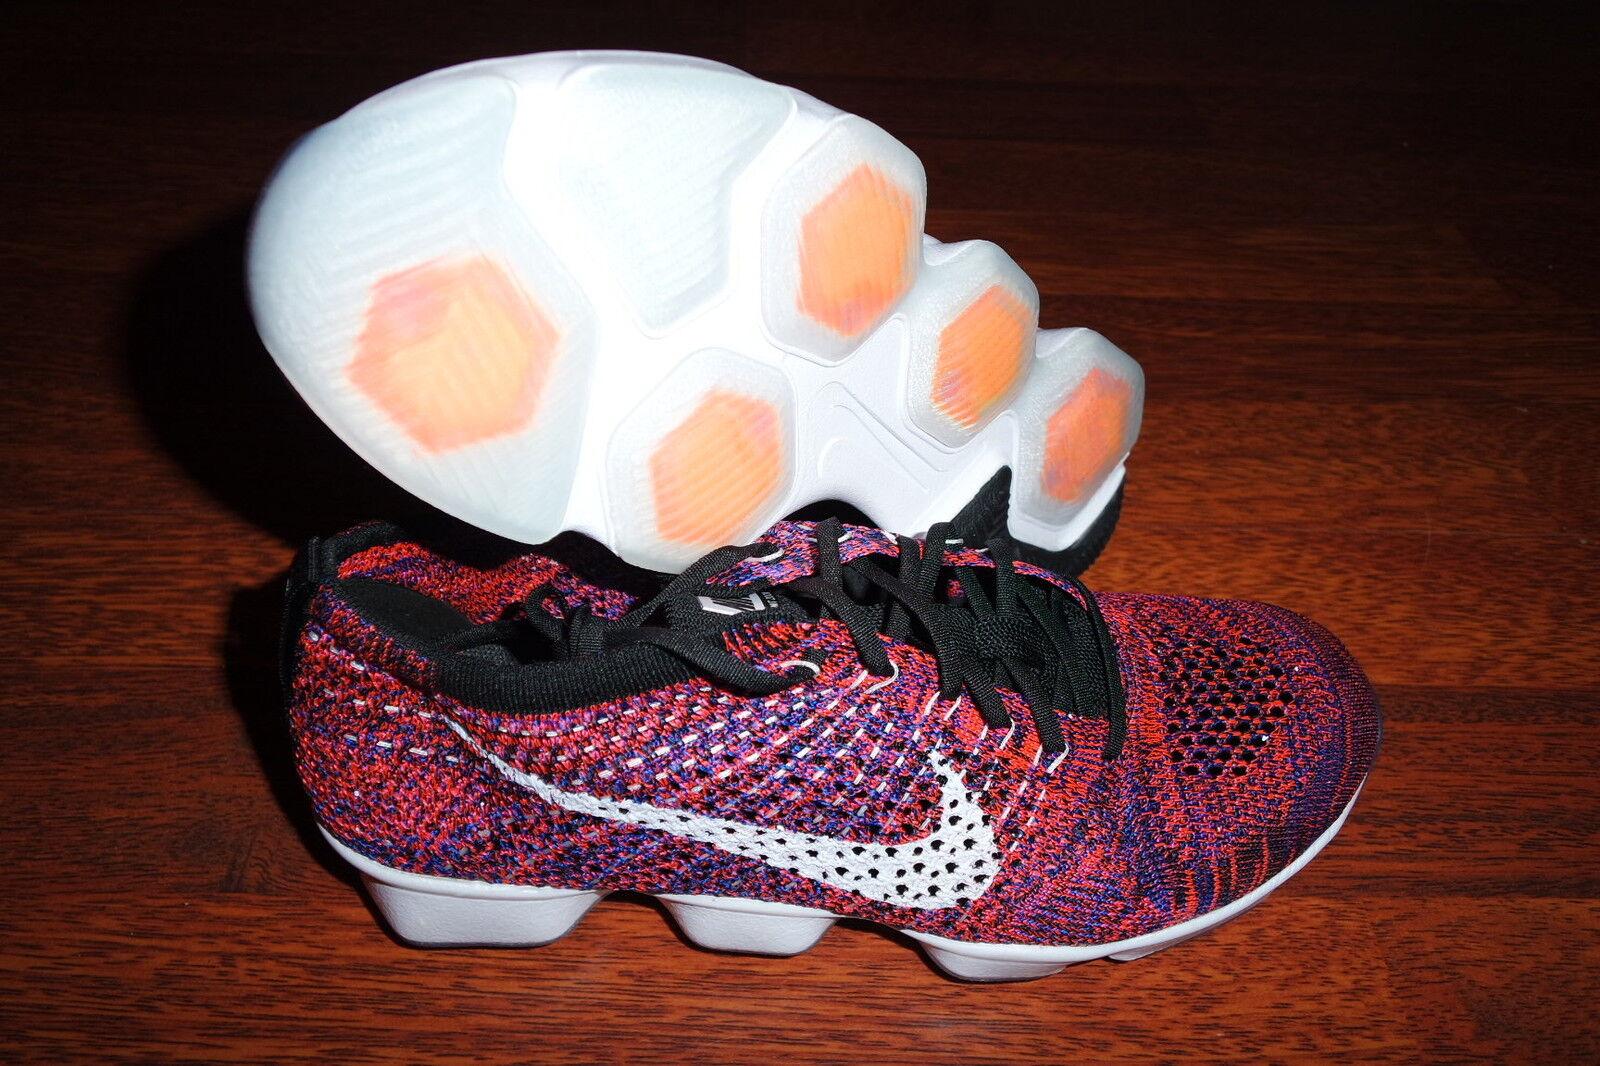 femmes Nike Flyknit Zoom Agility CRIMSON $150 698616 603 RUNNING SZ 8, 9.5 RARE